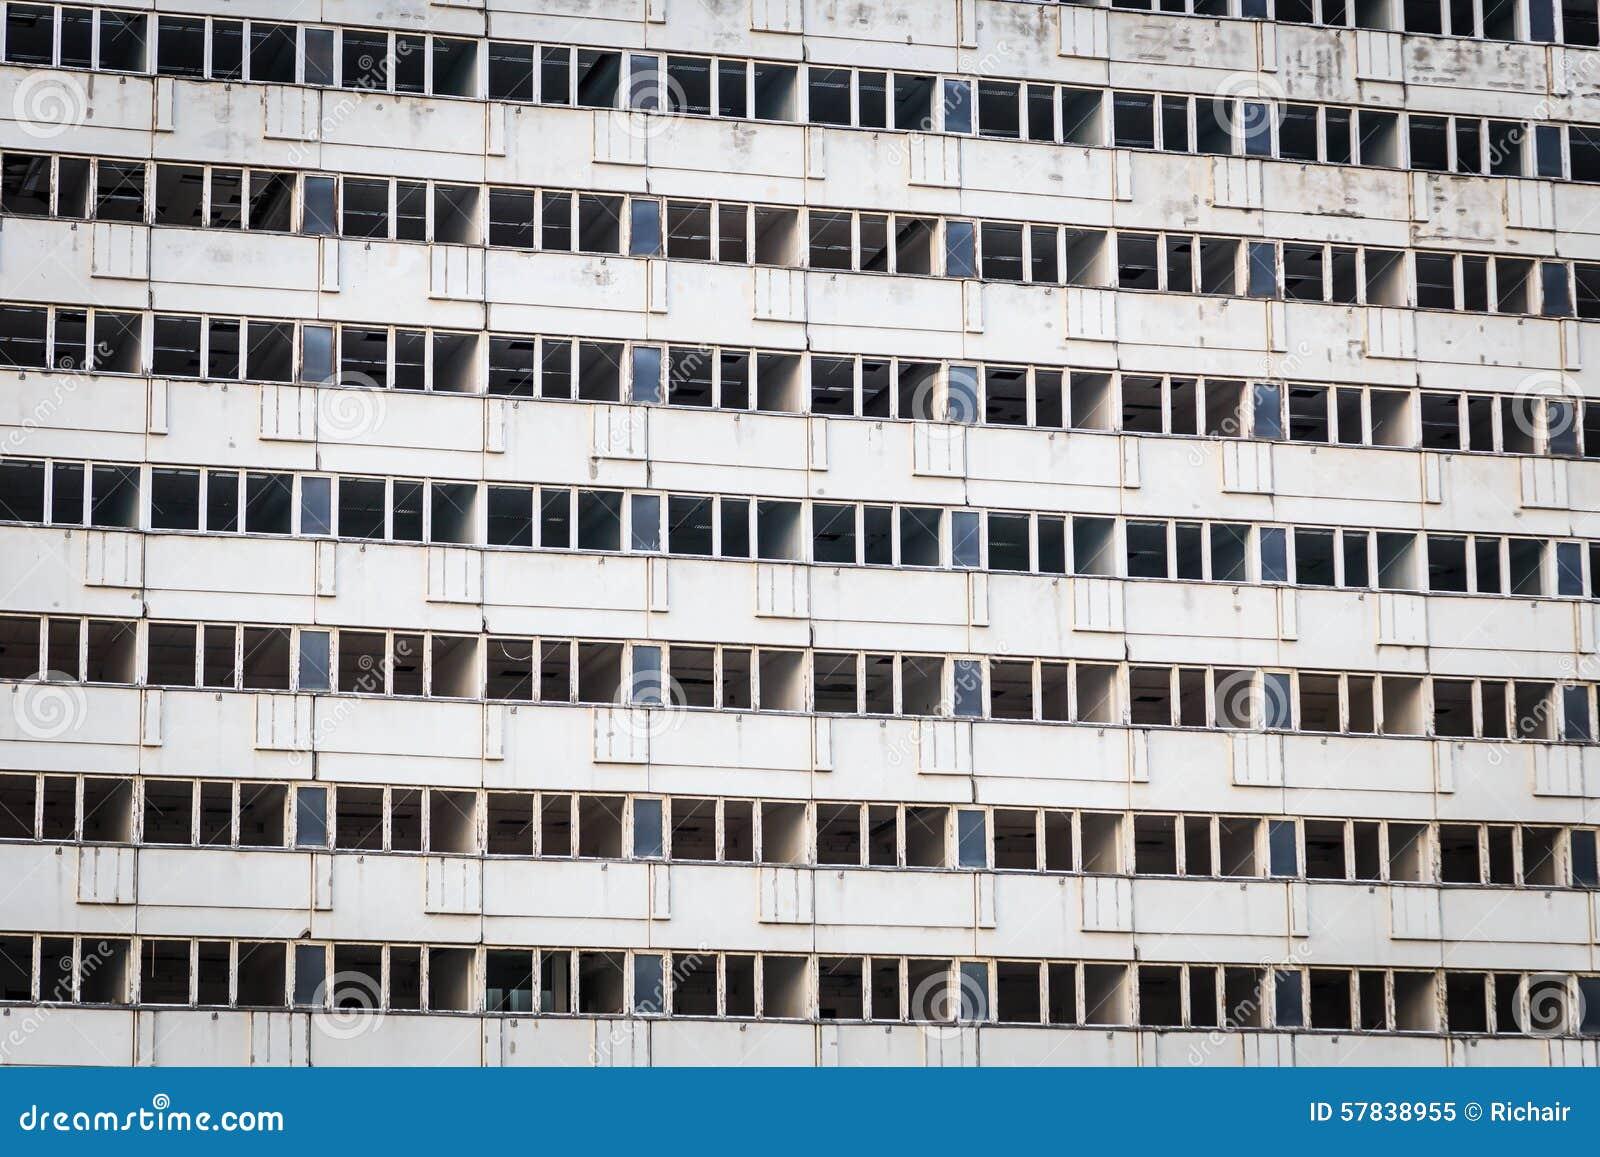 Edificio concreto vacío